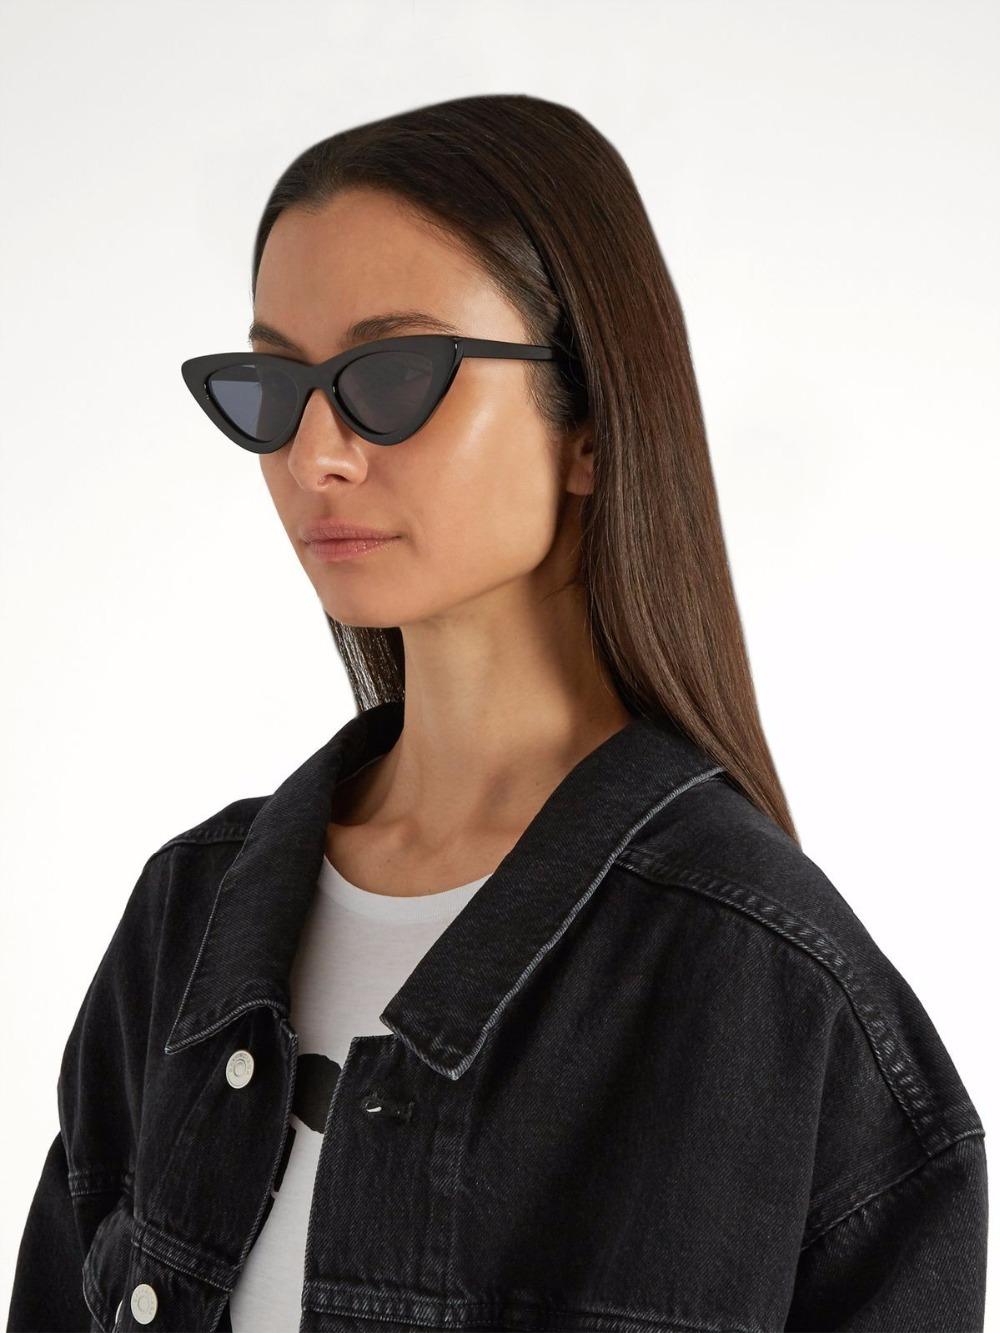 HTB1r9fPnrsTMeJjSszdq6AEupXaY - WHO CUTIE 2018 Brand Designer Black Cat Eye Sunglasses Women Cool Small Cateye Frame Sun Glasses Fashion UV400 Shades WG-008